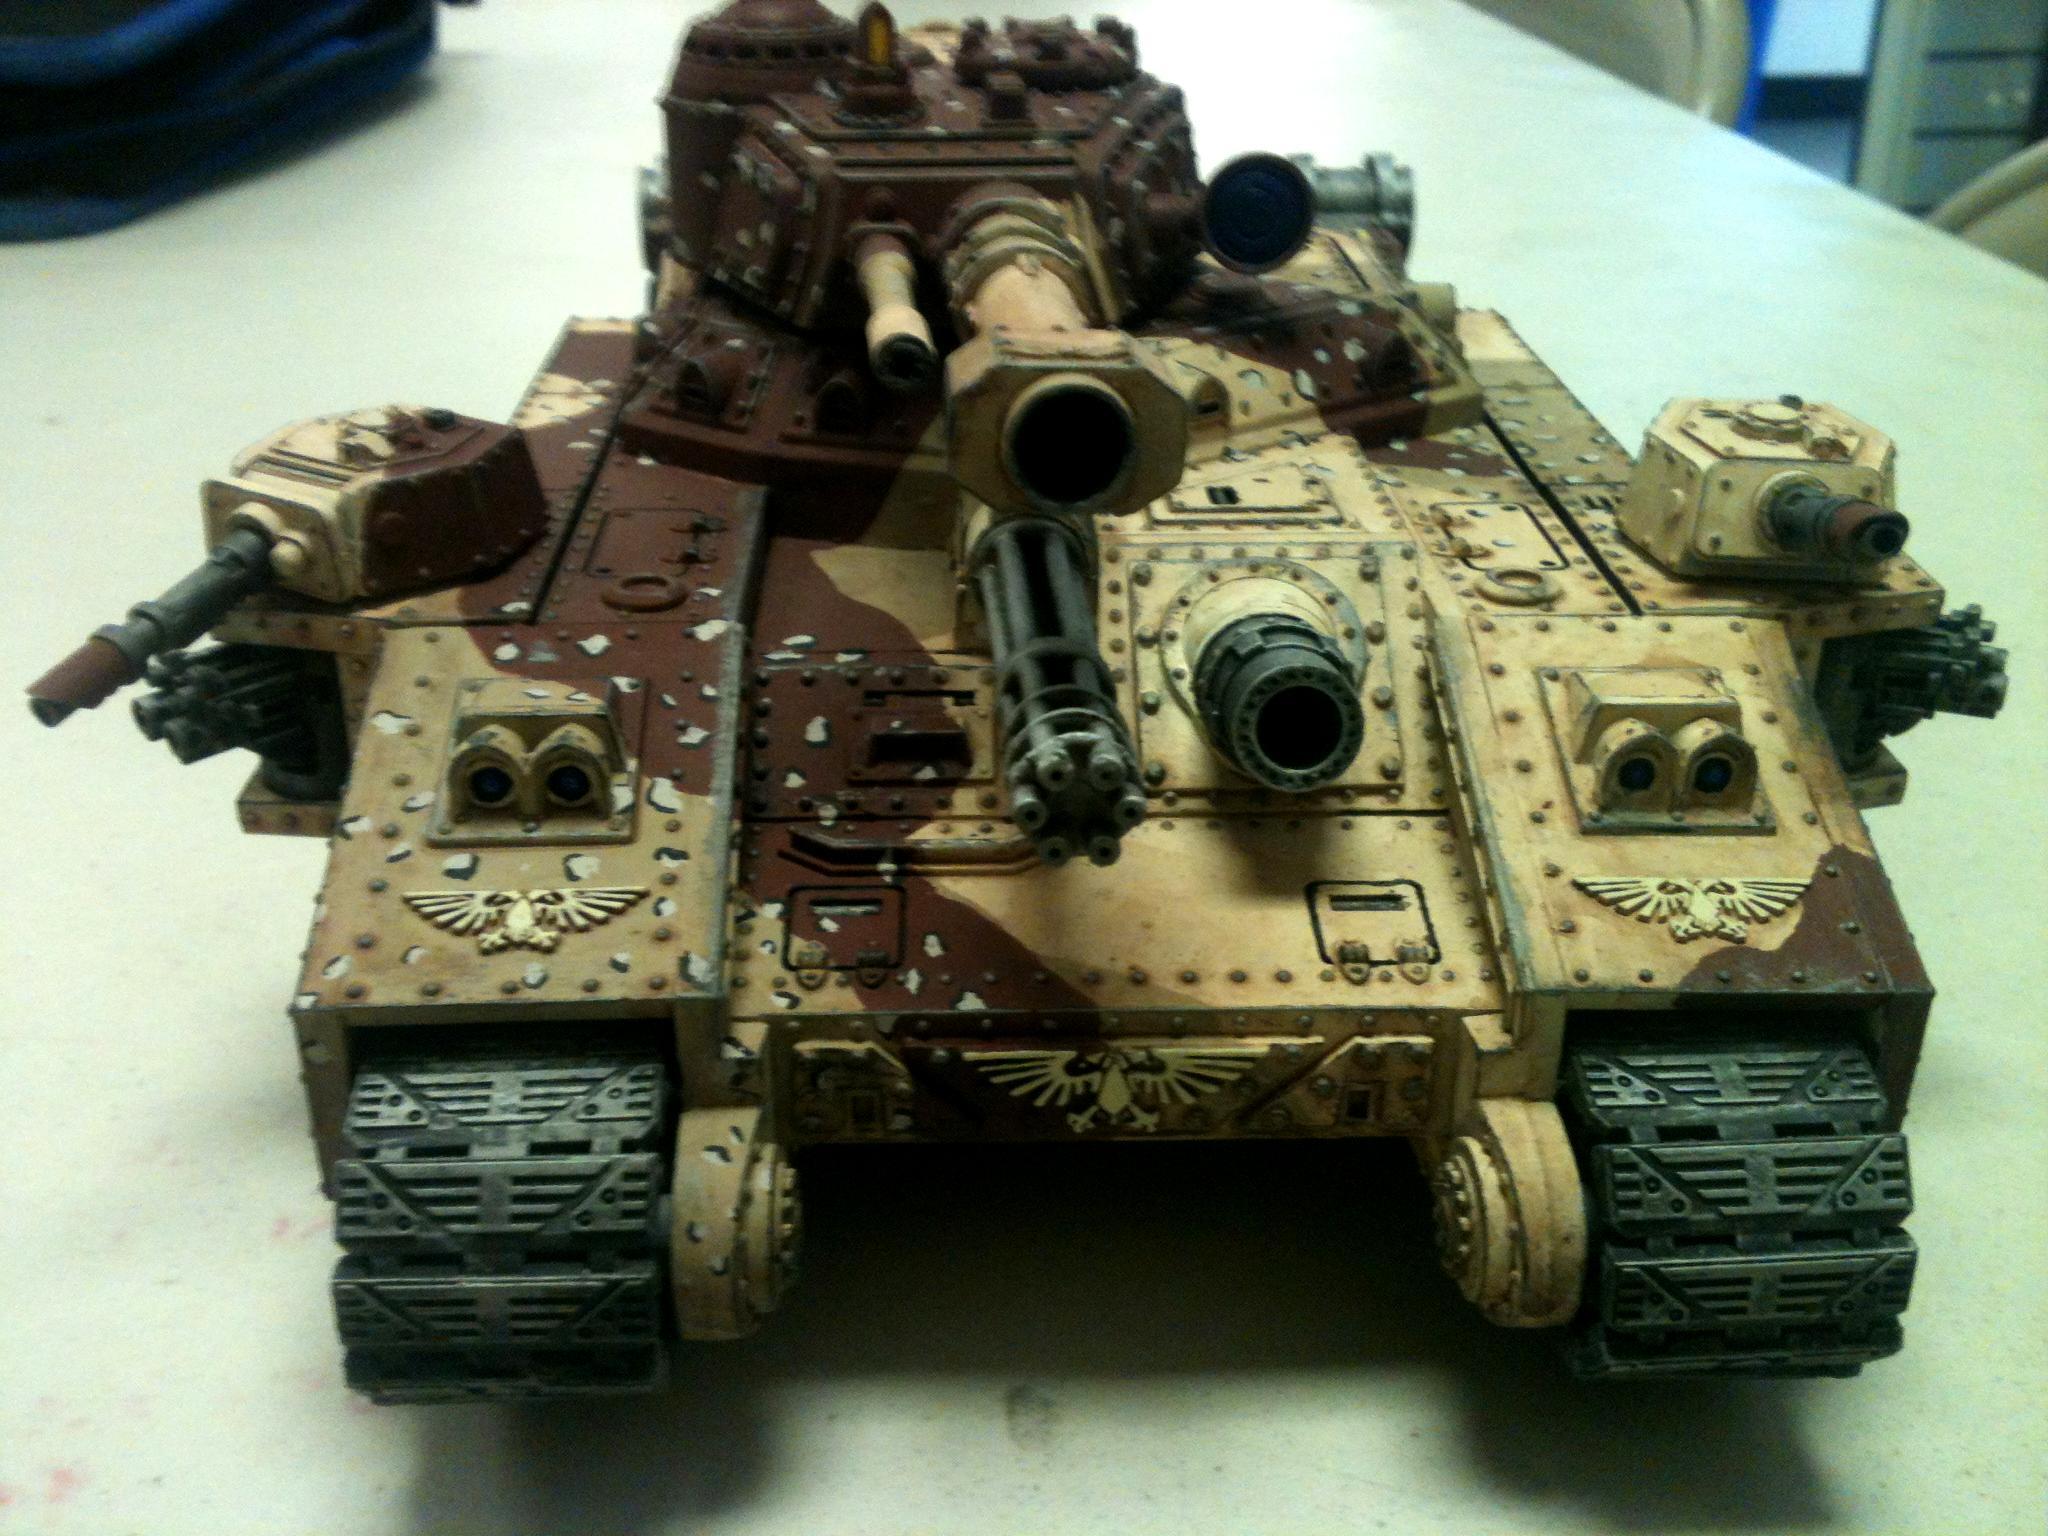 Baneblade, Desert Camo, Super-heavy, Warhammer 40,000